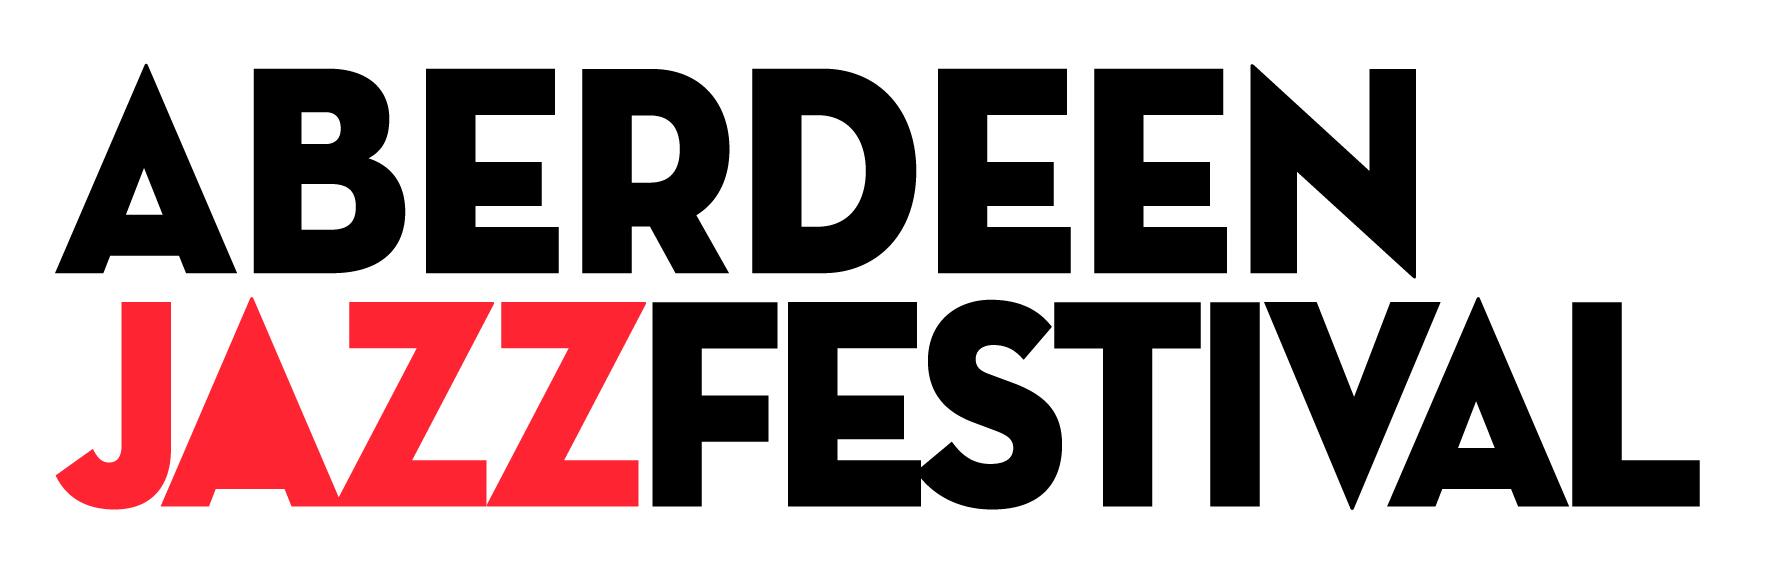 aberdeen-jazz-festival-logo-2015